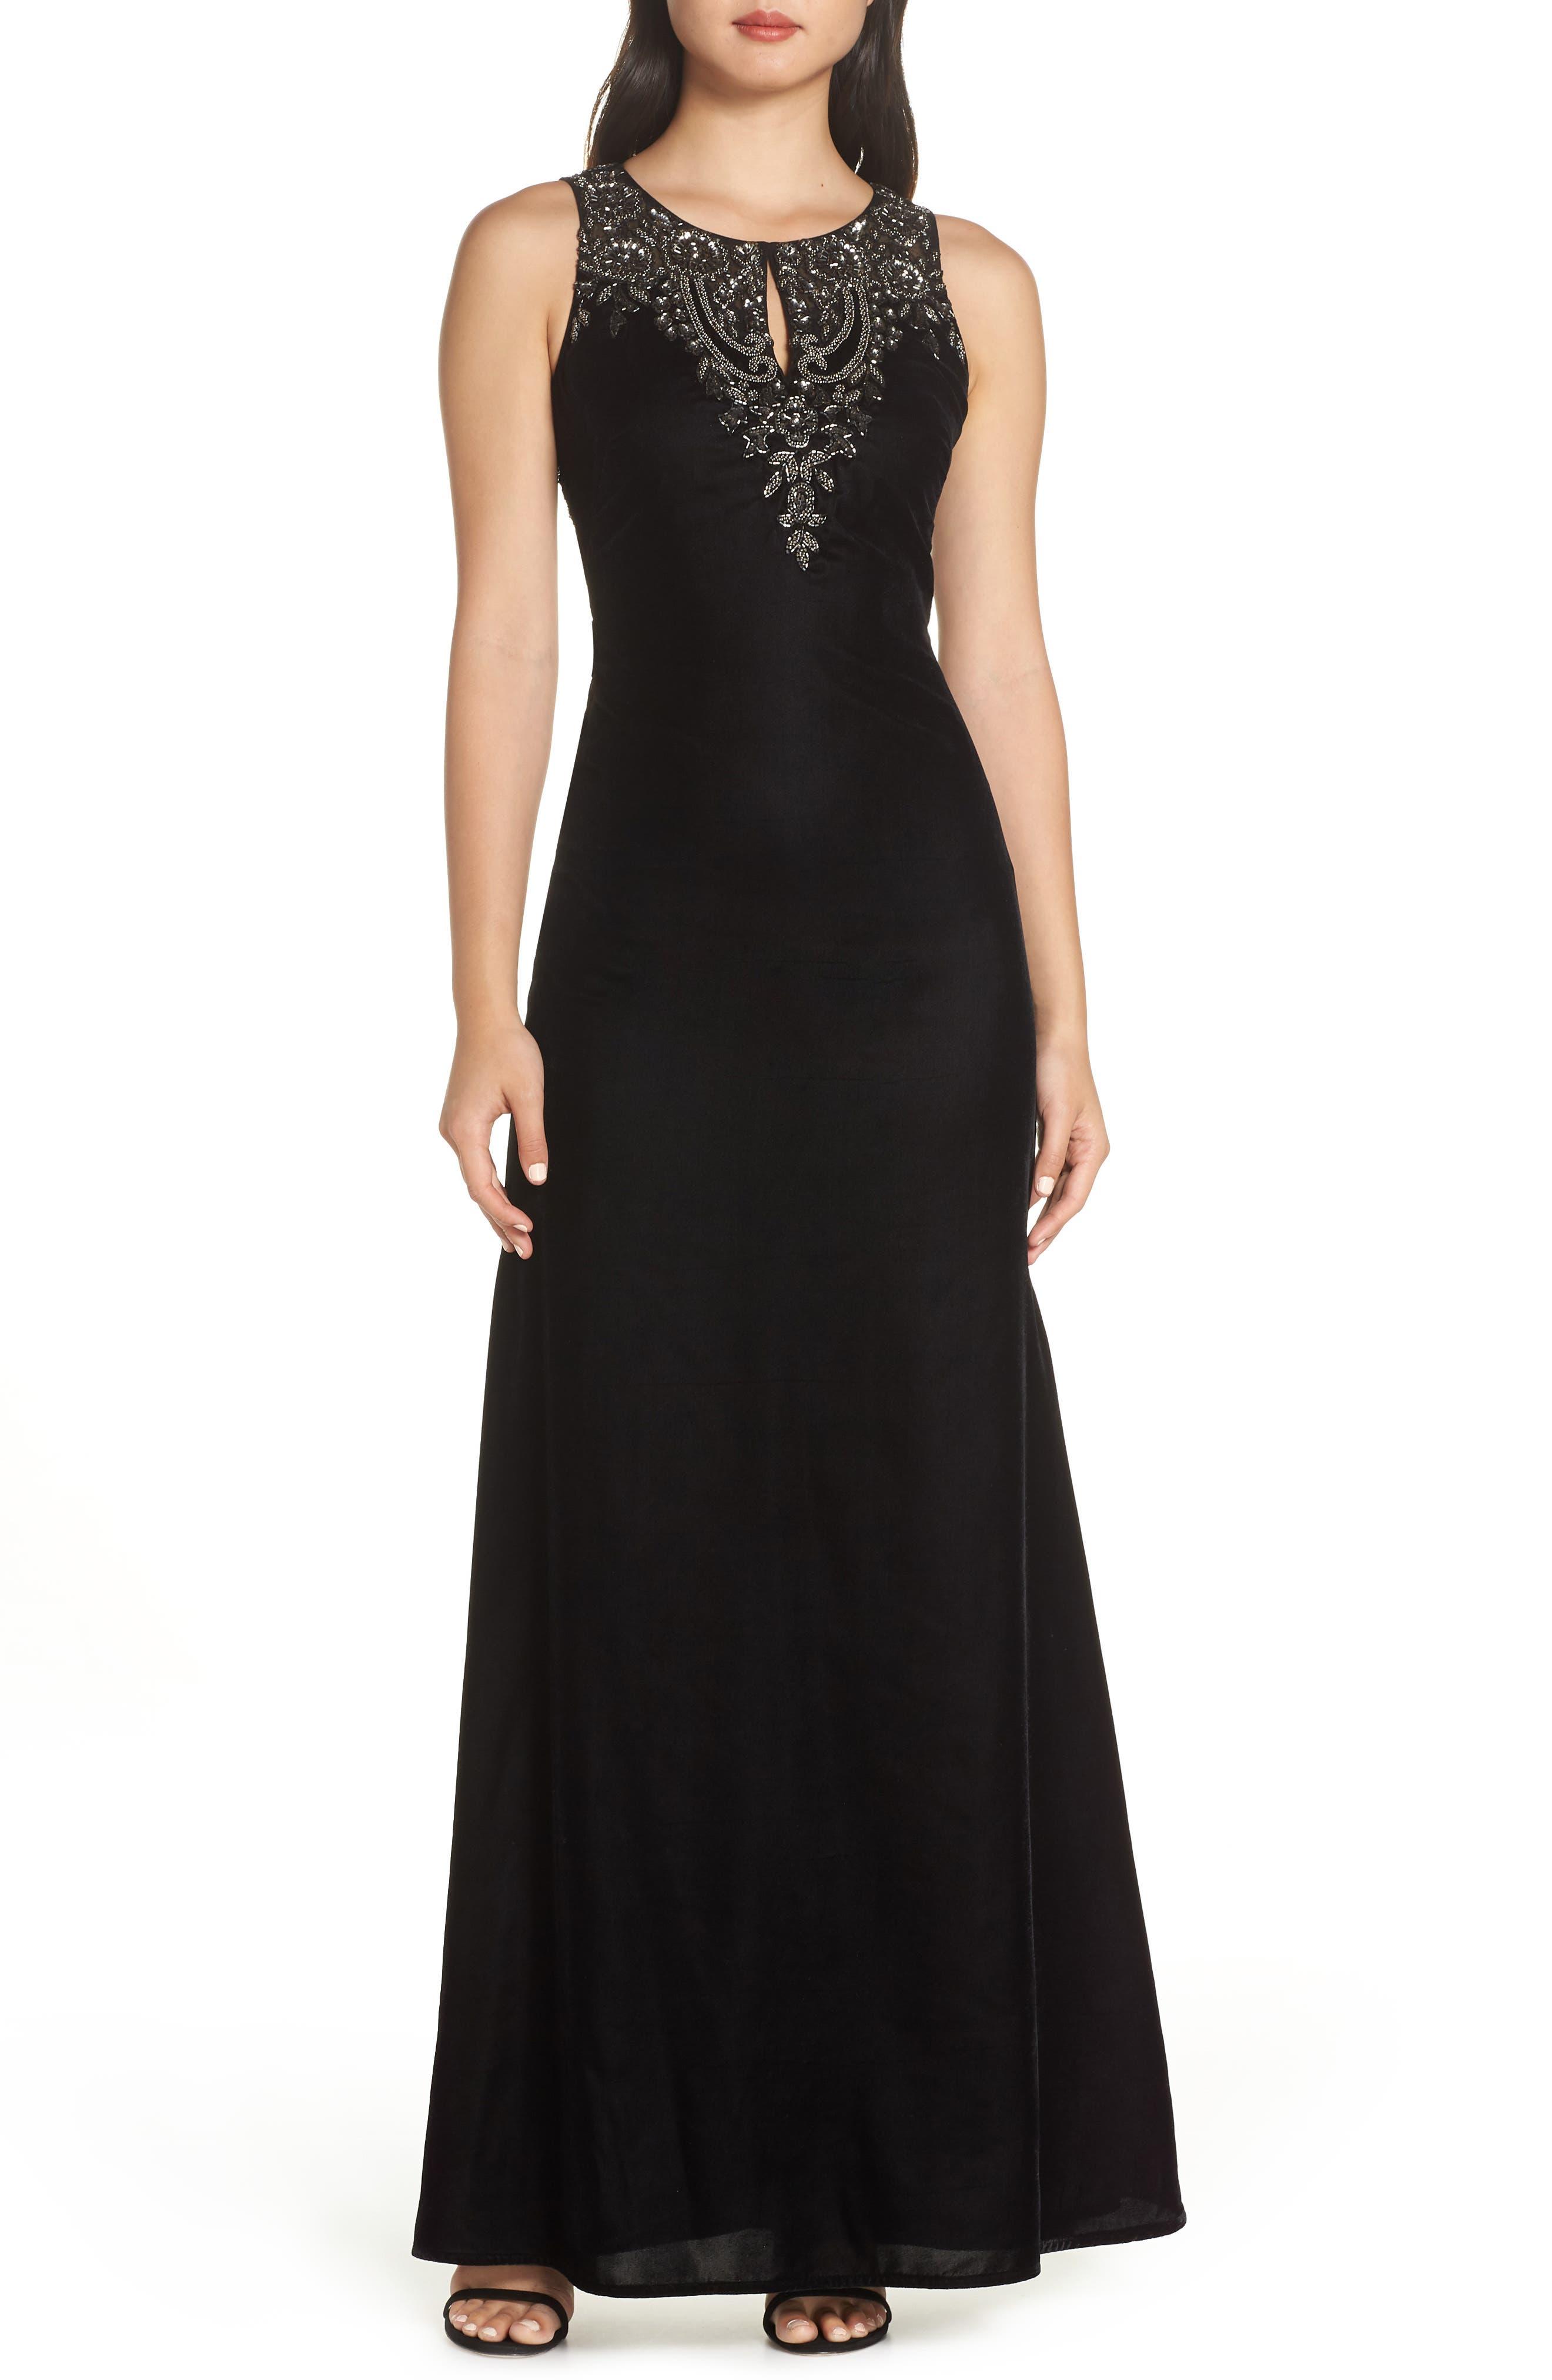 ADRIANNA PAPELL Embellished Velvet Gown in Black/ Mercury